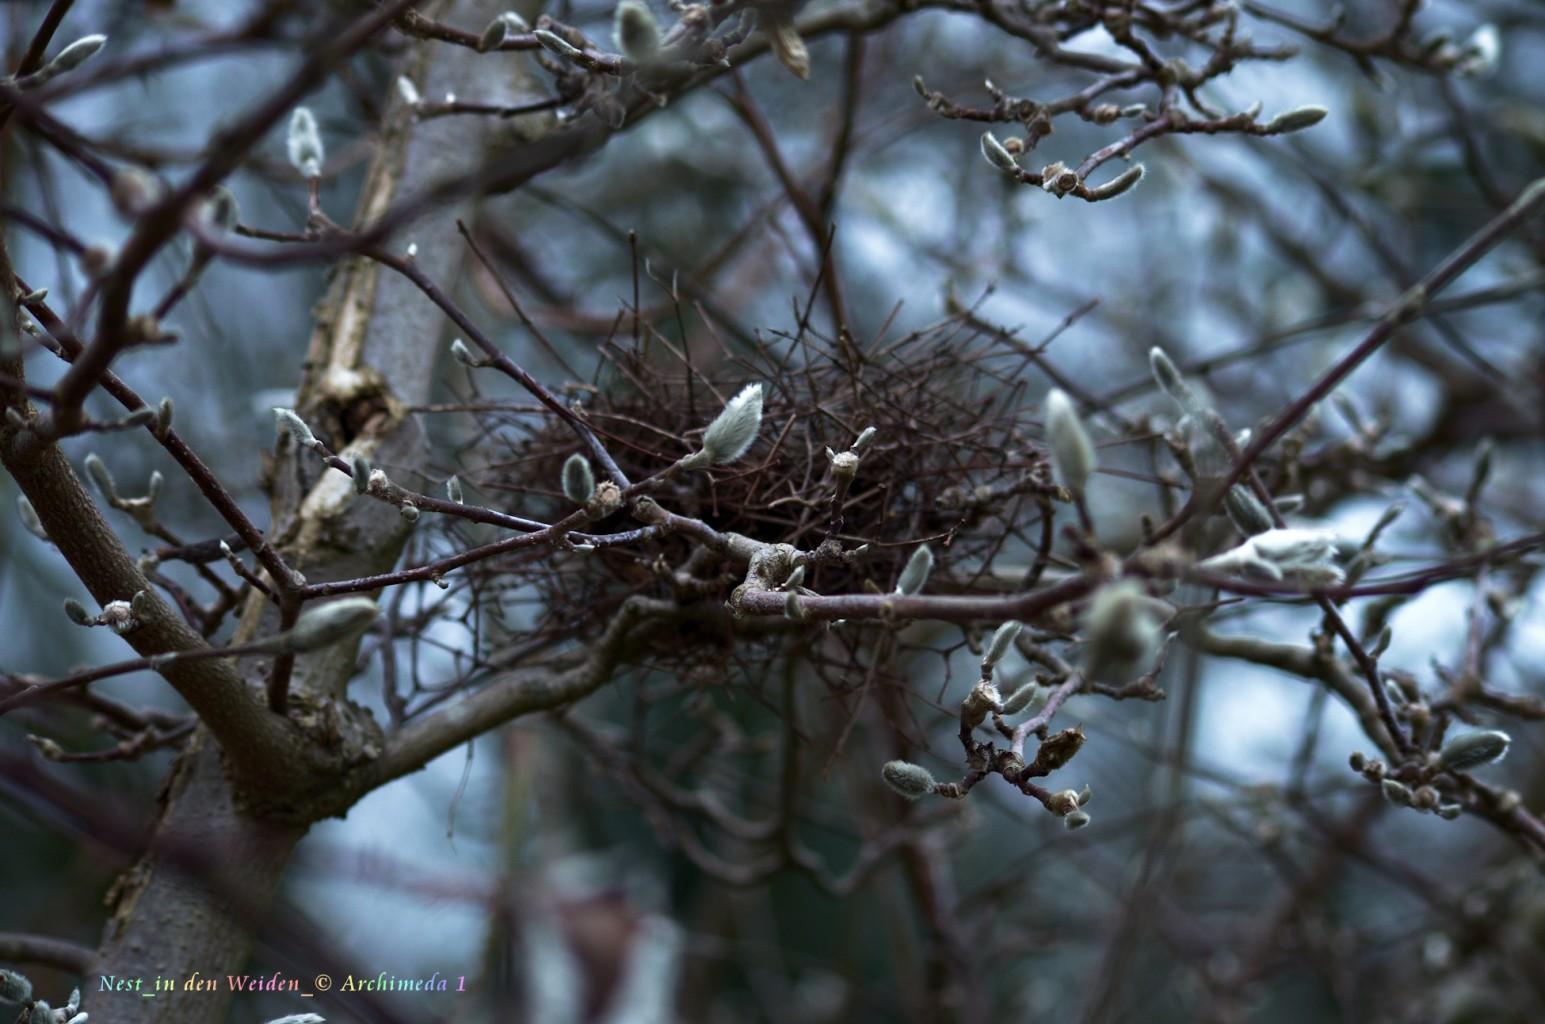 Nest_in den Weiden_© Archimeda 1